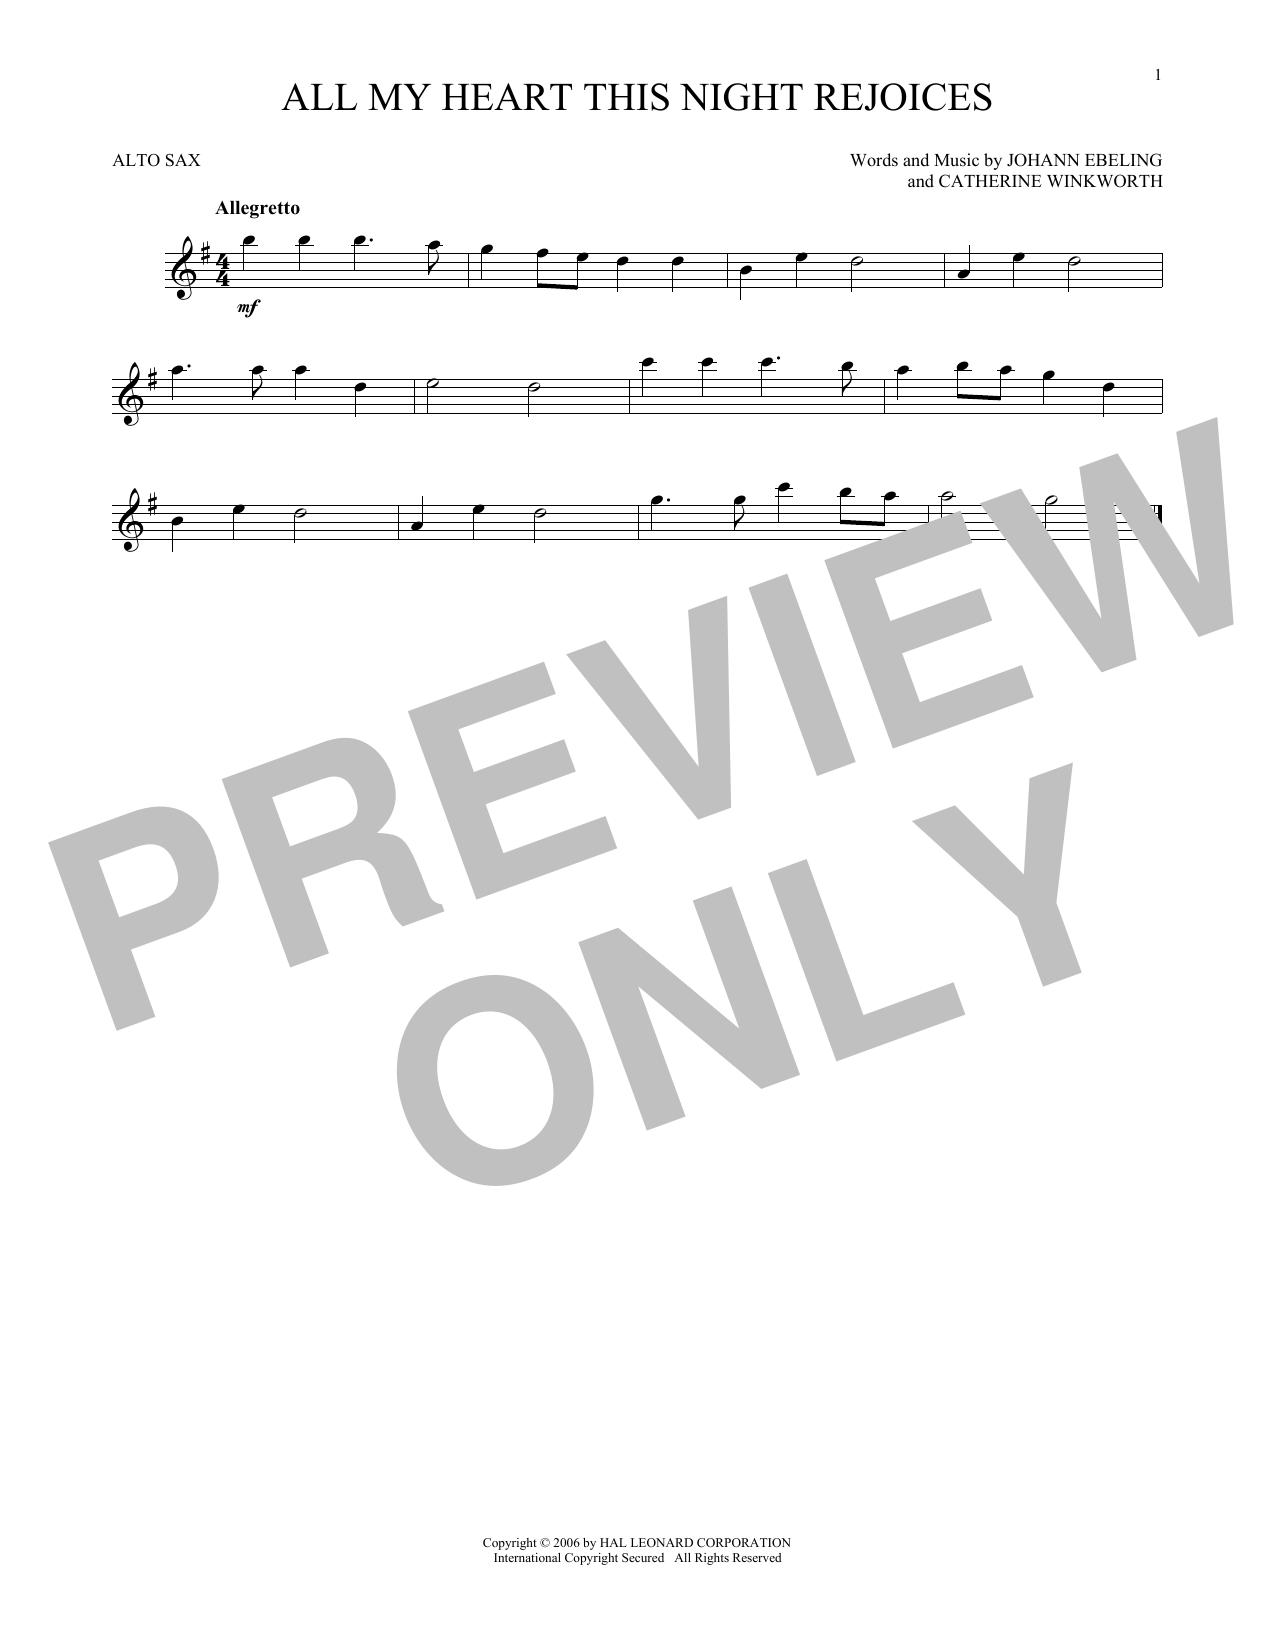 All My Heart This Night Rejoices (Alto Sax Solo)